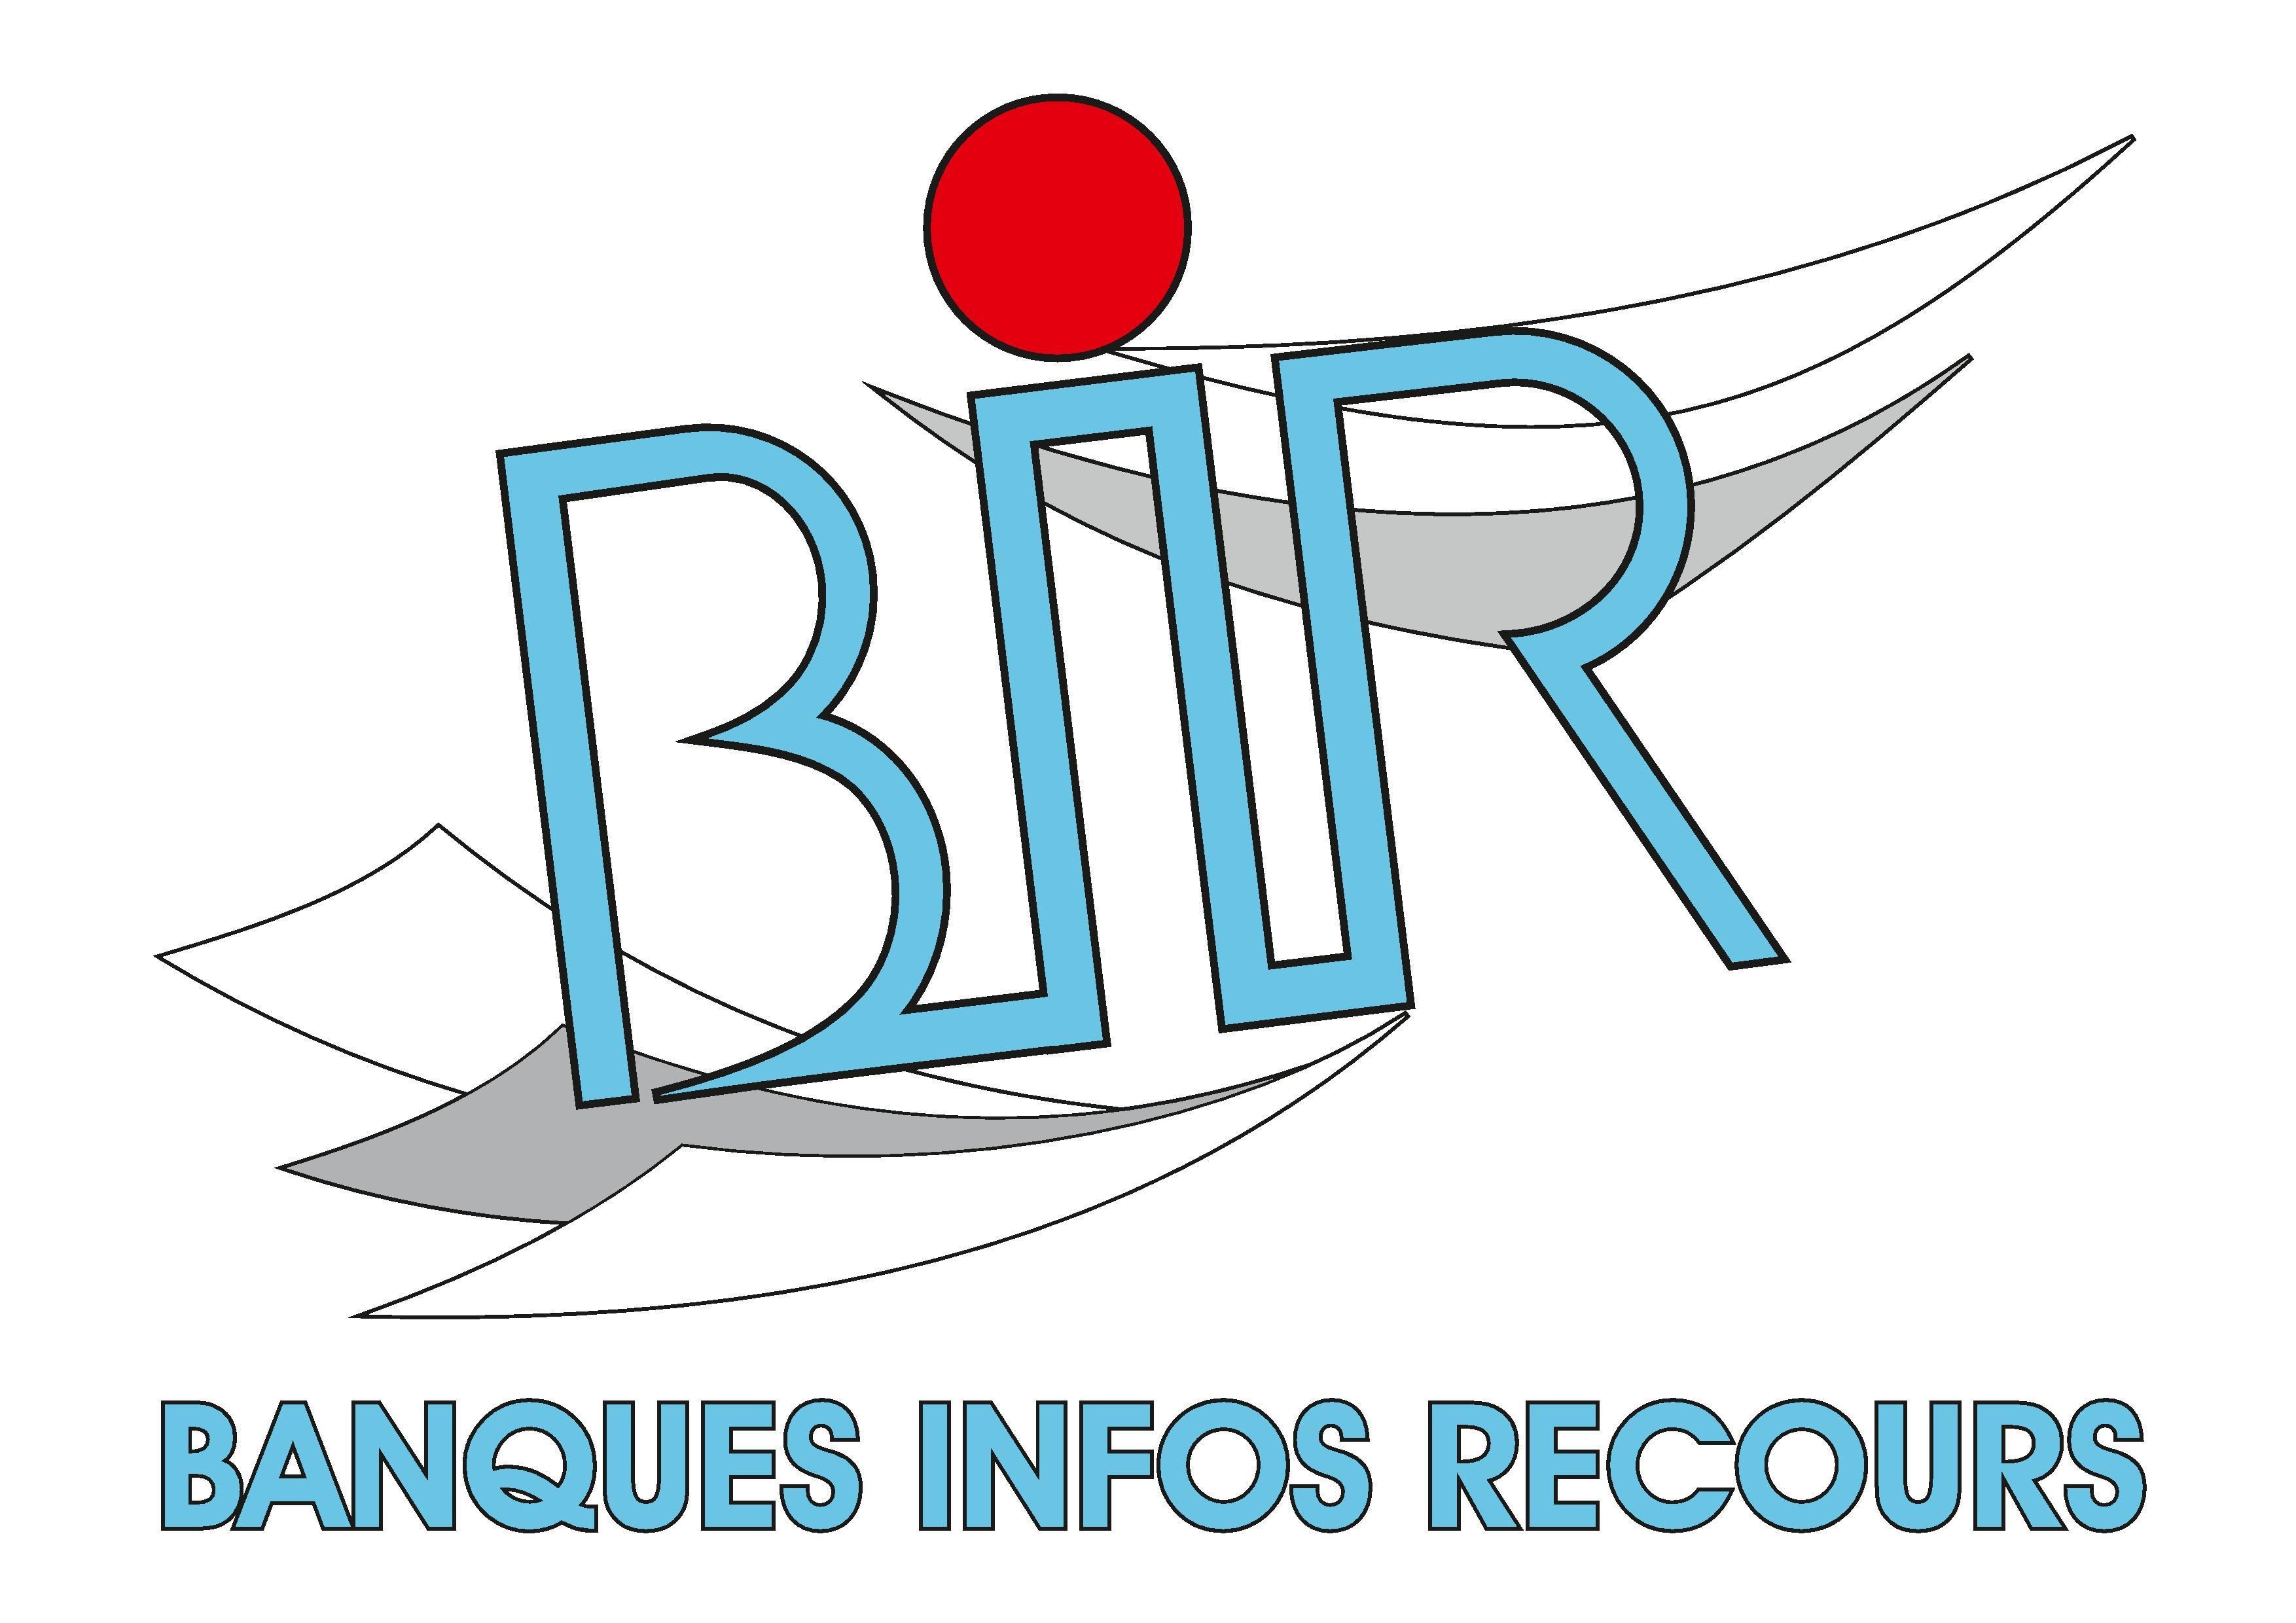 Banques Infos Recours